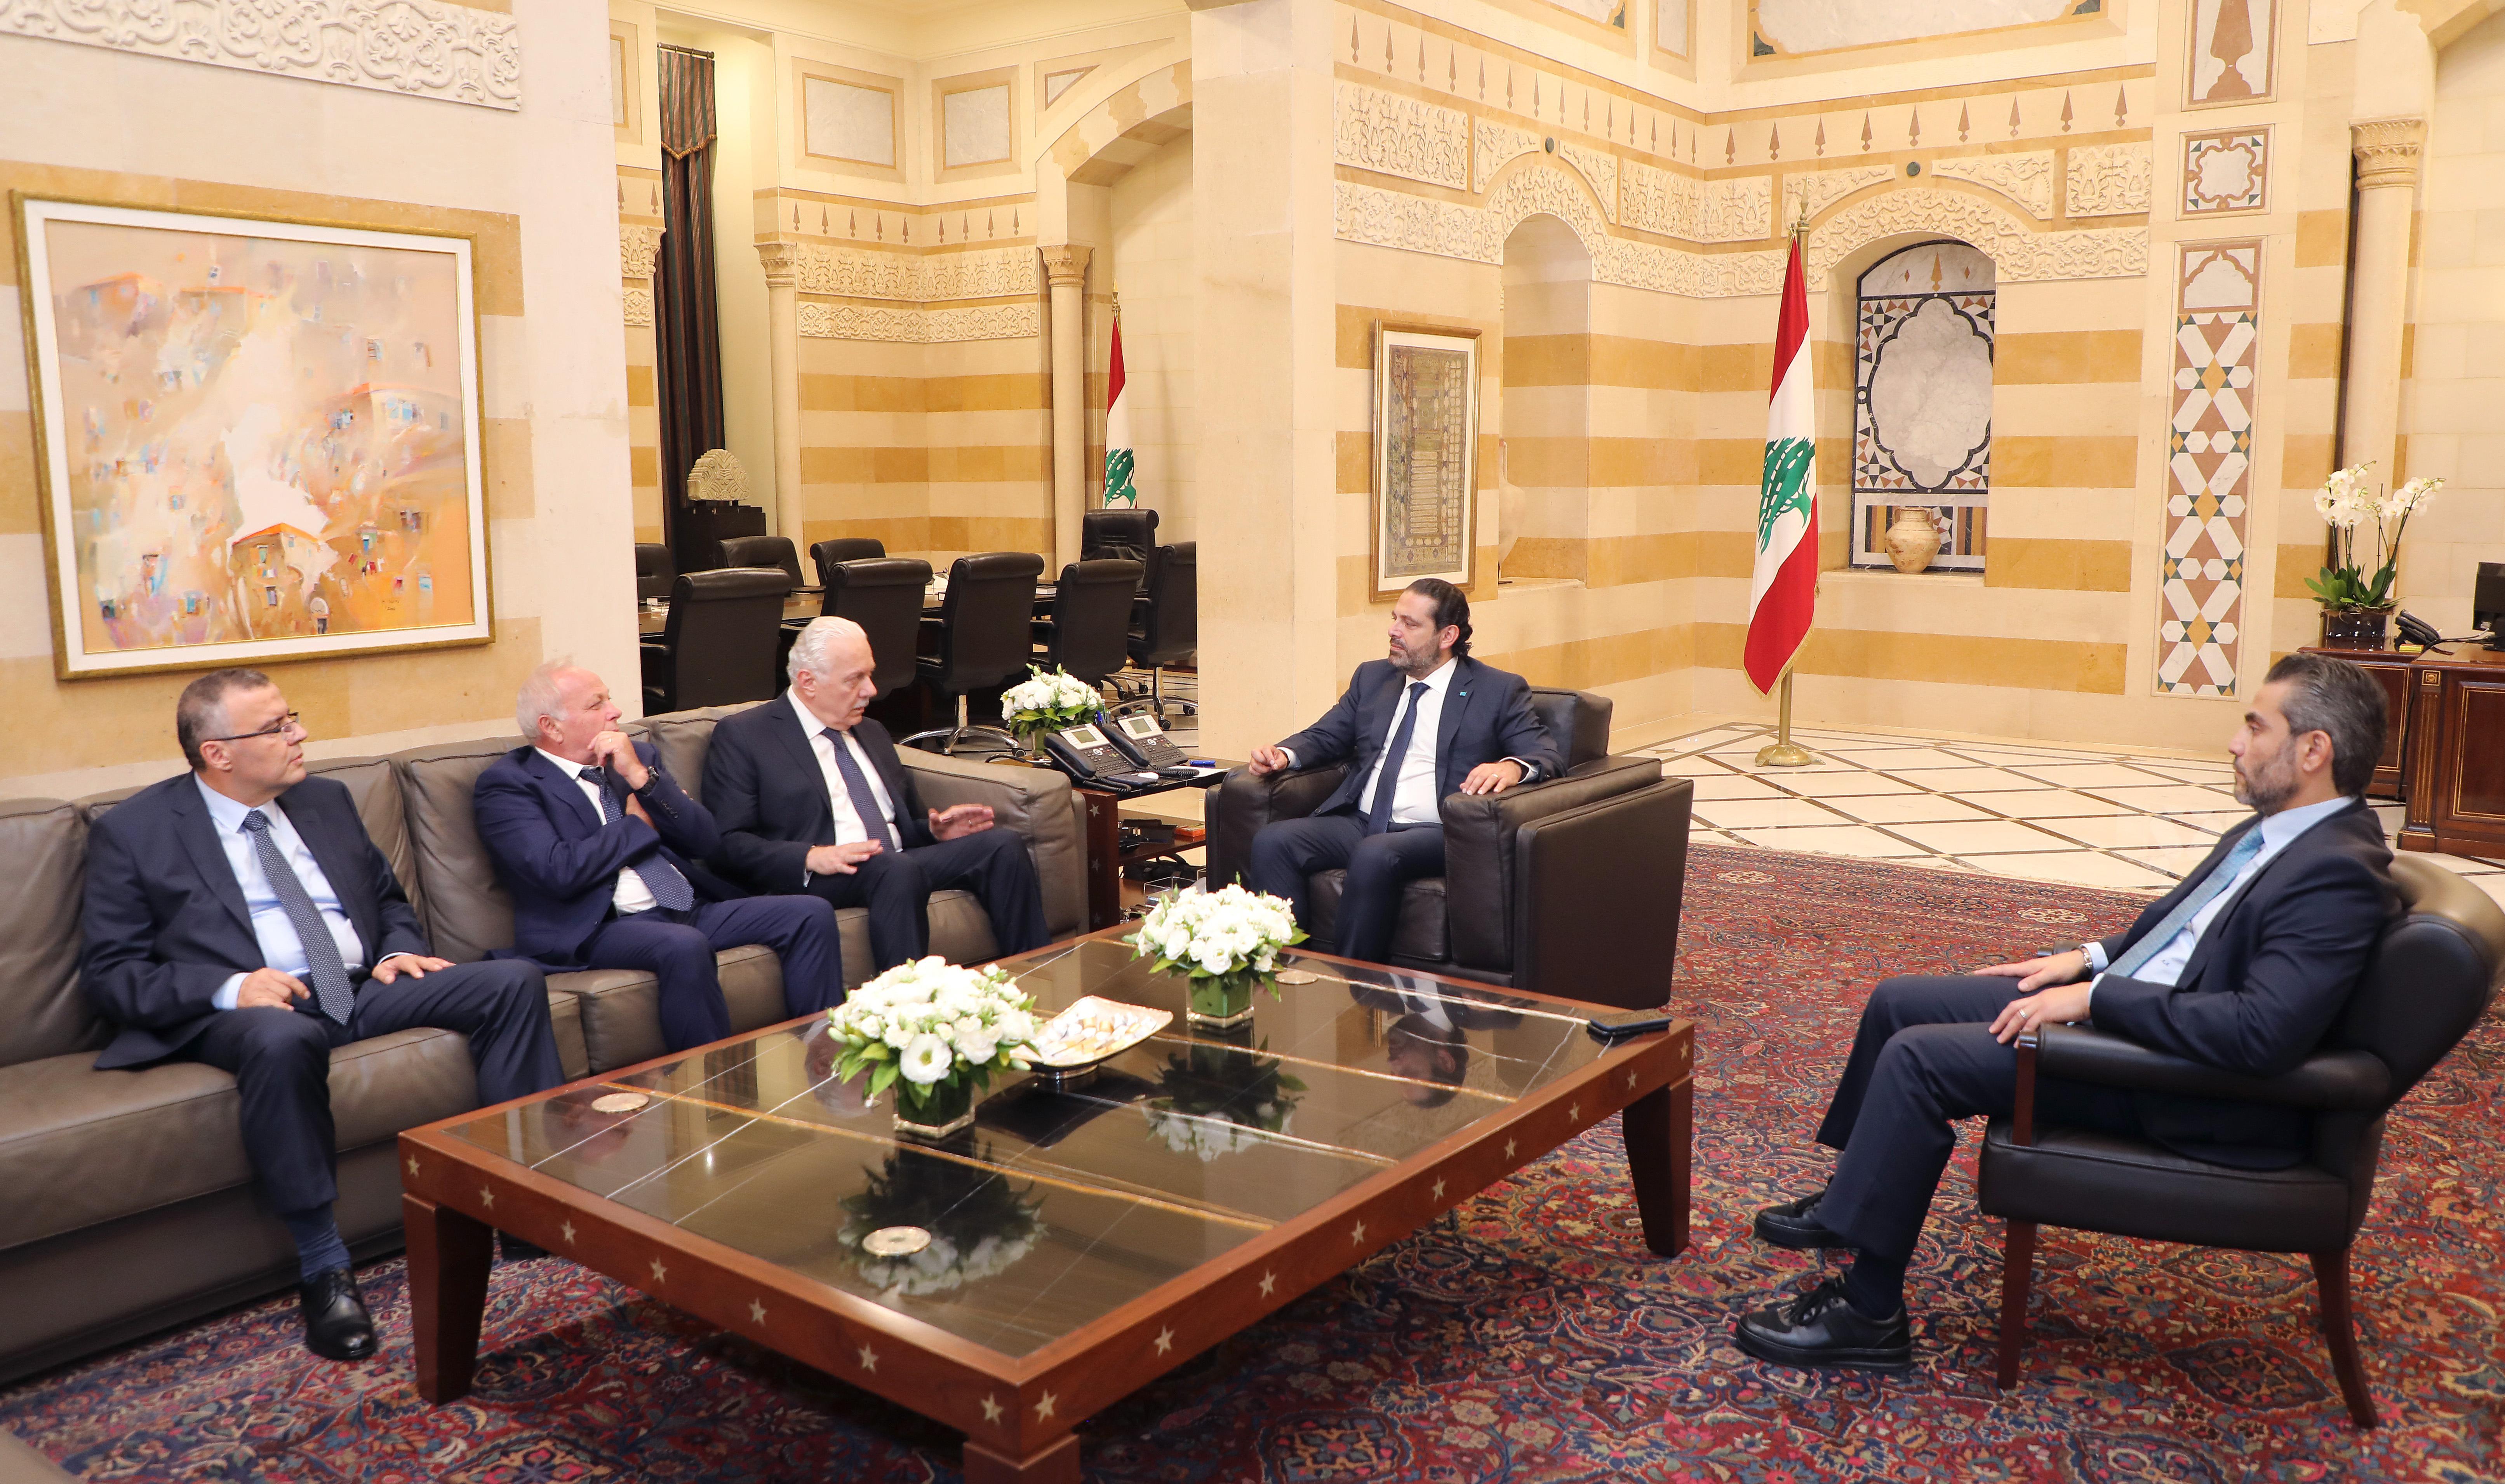 Pr Minister Saad Hariri meets Judge Souheil Abou with a Delegation